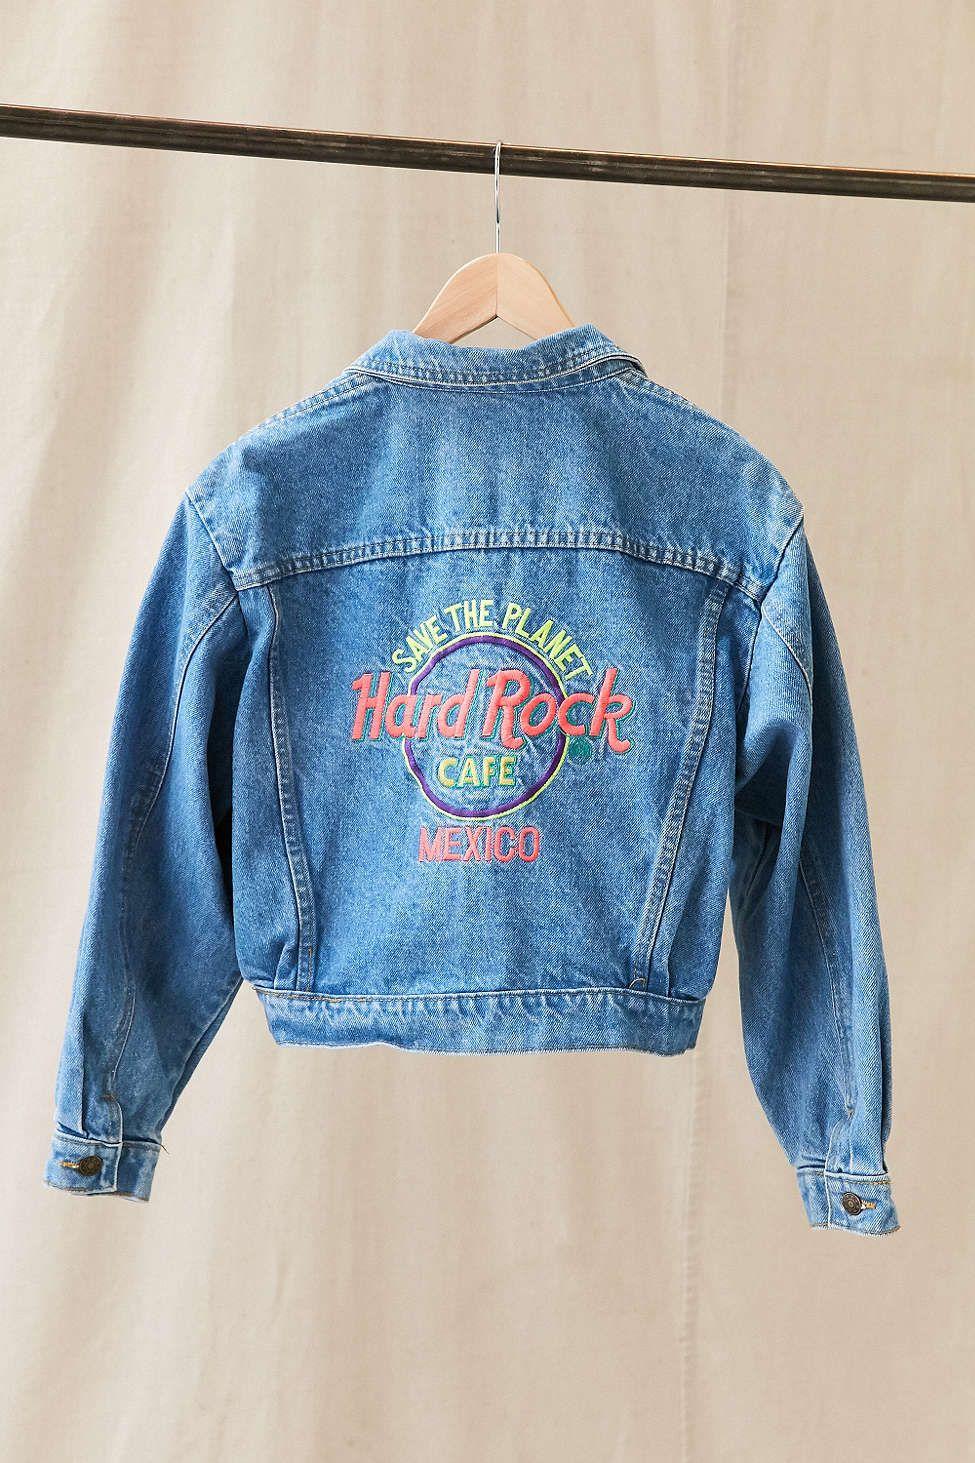 Vintage Hard Rock Mexico Denim Jacket Denim Jacket Vintage Clothes Women Vintage Denim Jacket [ 1463 x 975 Pixel ]